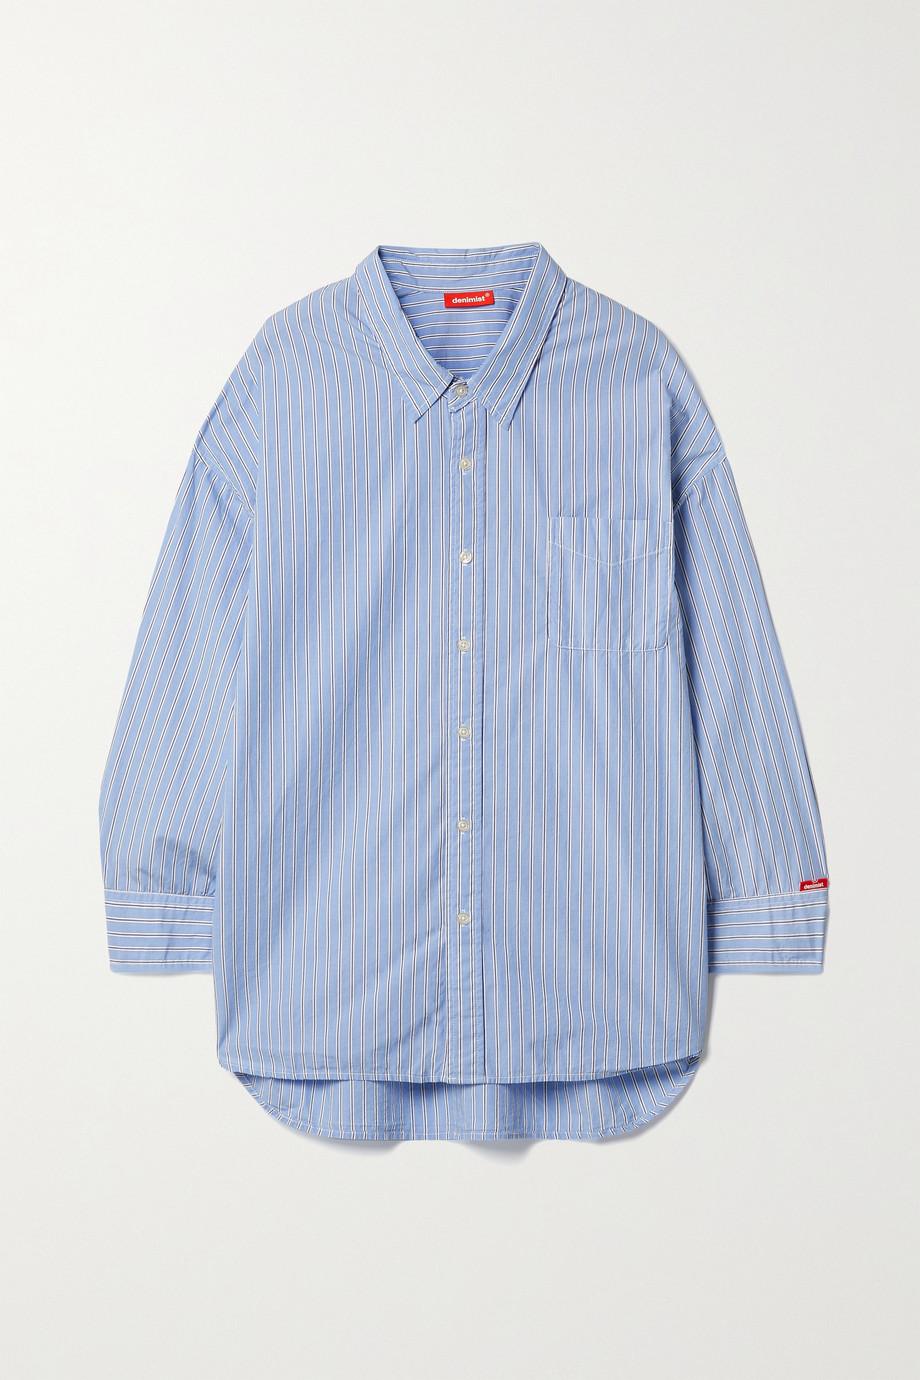 Denimist 条纹纯棉府绸衬衫